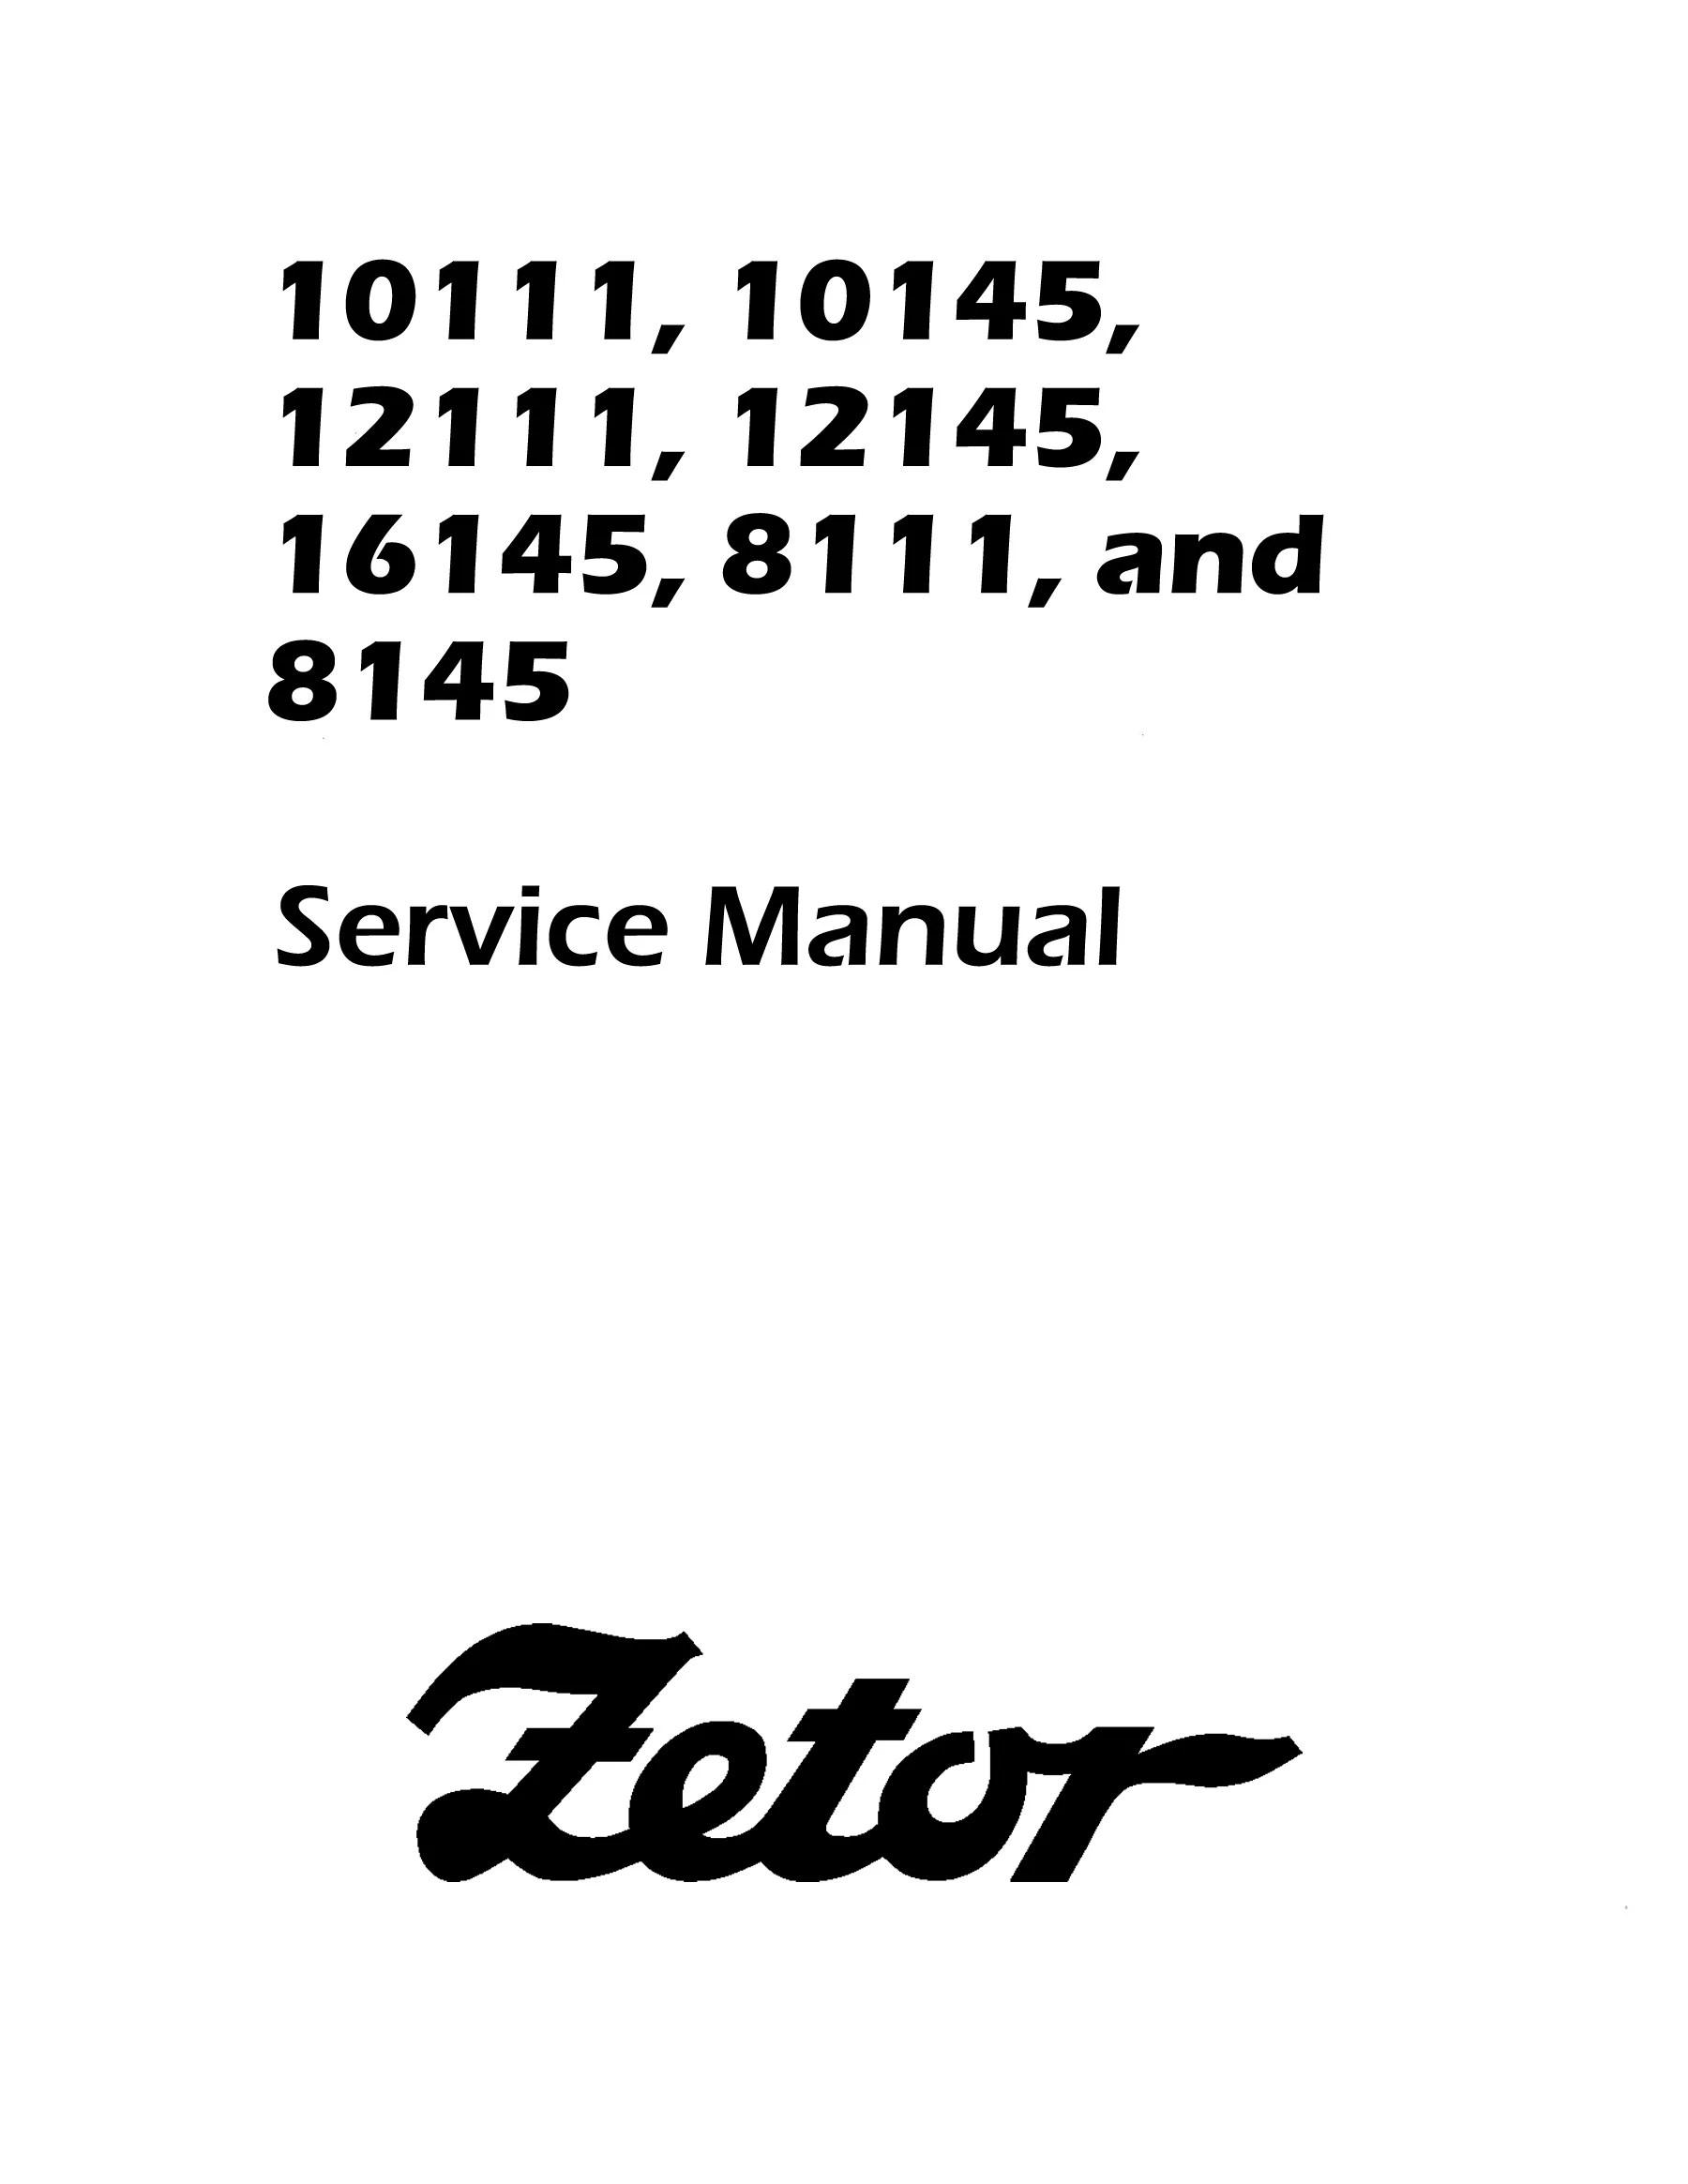 Zetor 10111, 10145, 12111, 12145, 16145, 8111, and 8145